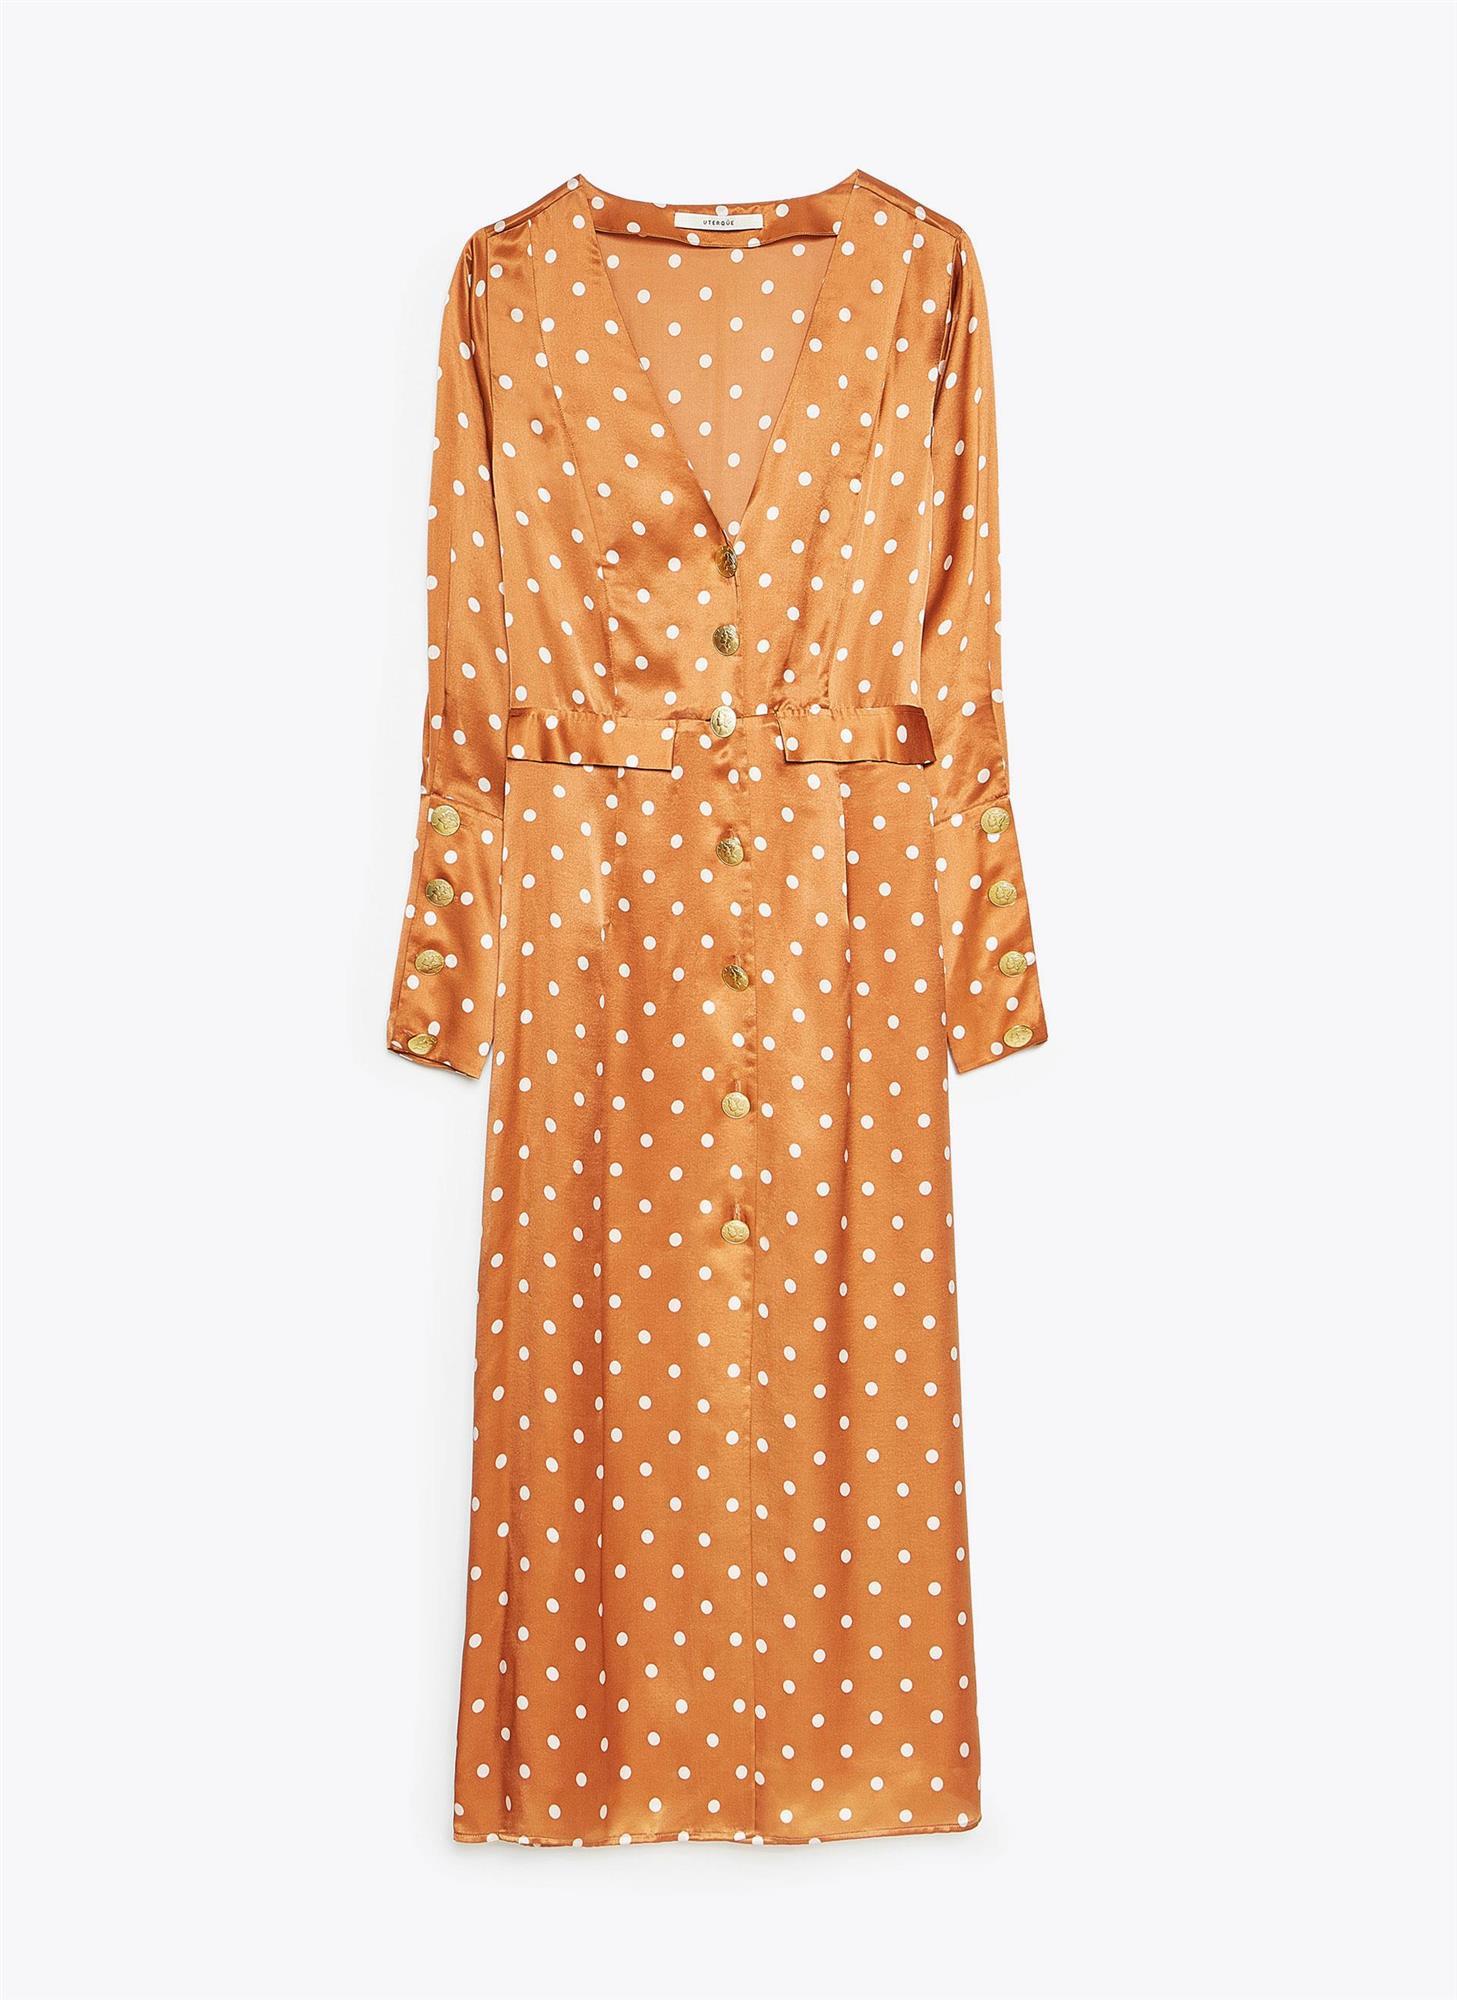 ab5e3f985 vestido de invitada primavera verano 2019 naranja. Vestido naranja